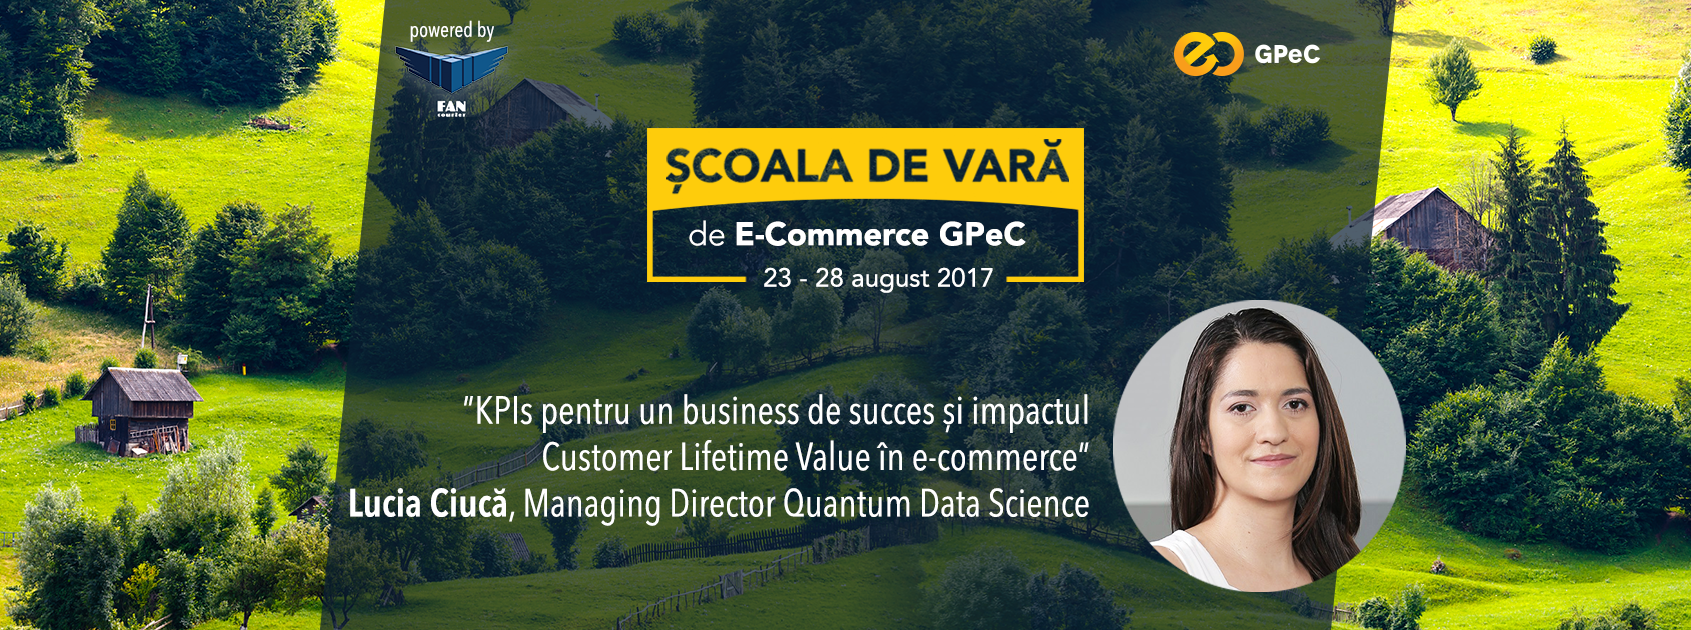 Lucia Ciuca KPI ecommerce